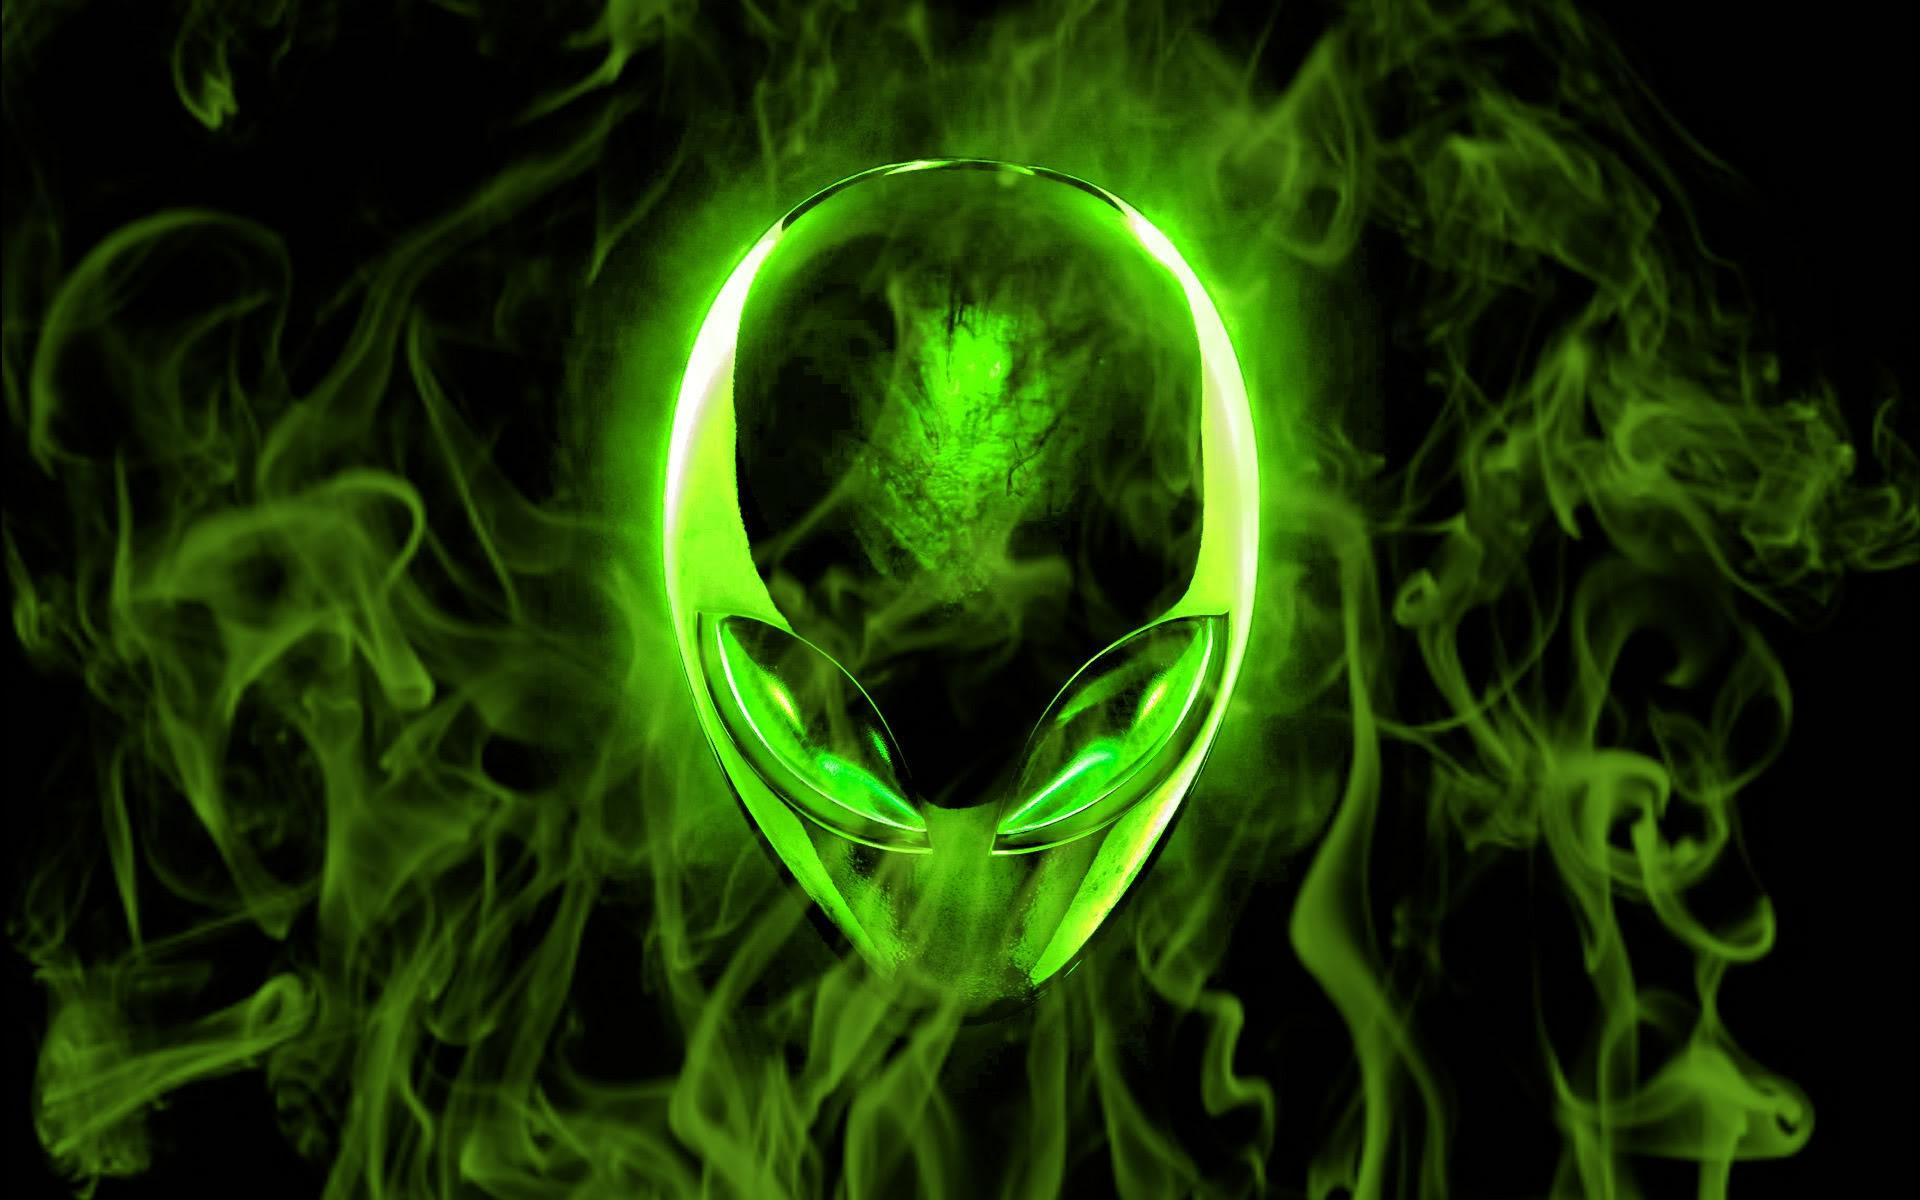 Green Alien and Smoke Computer Wallpapers, Desktop Backgrounds